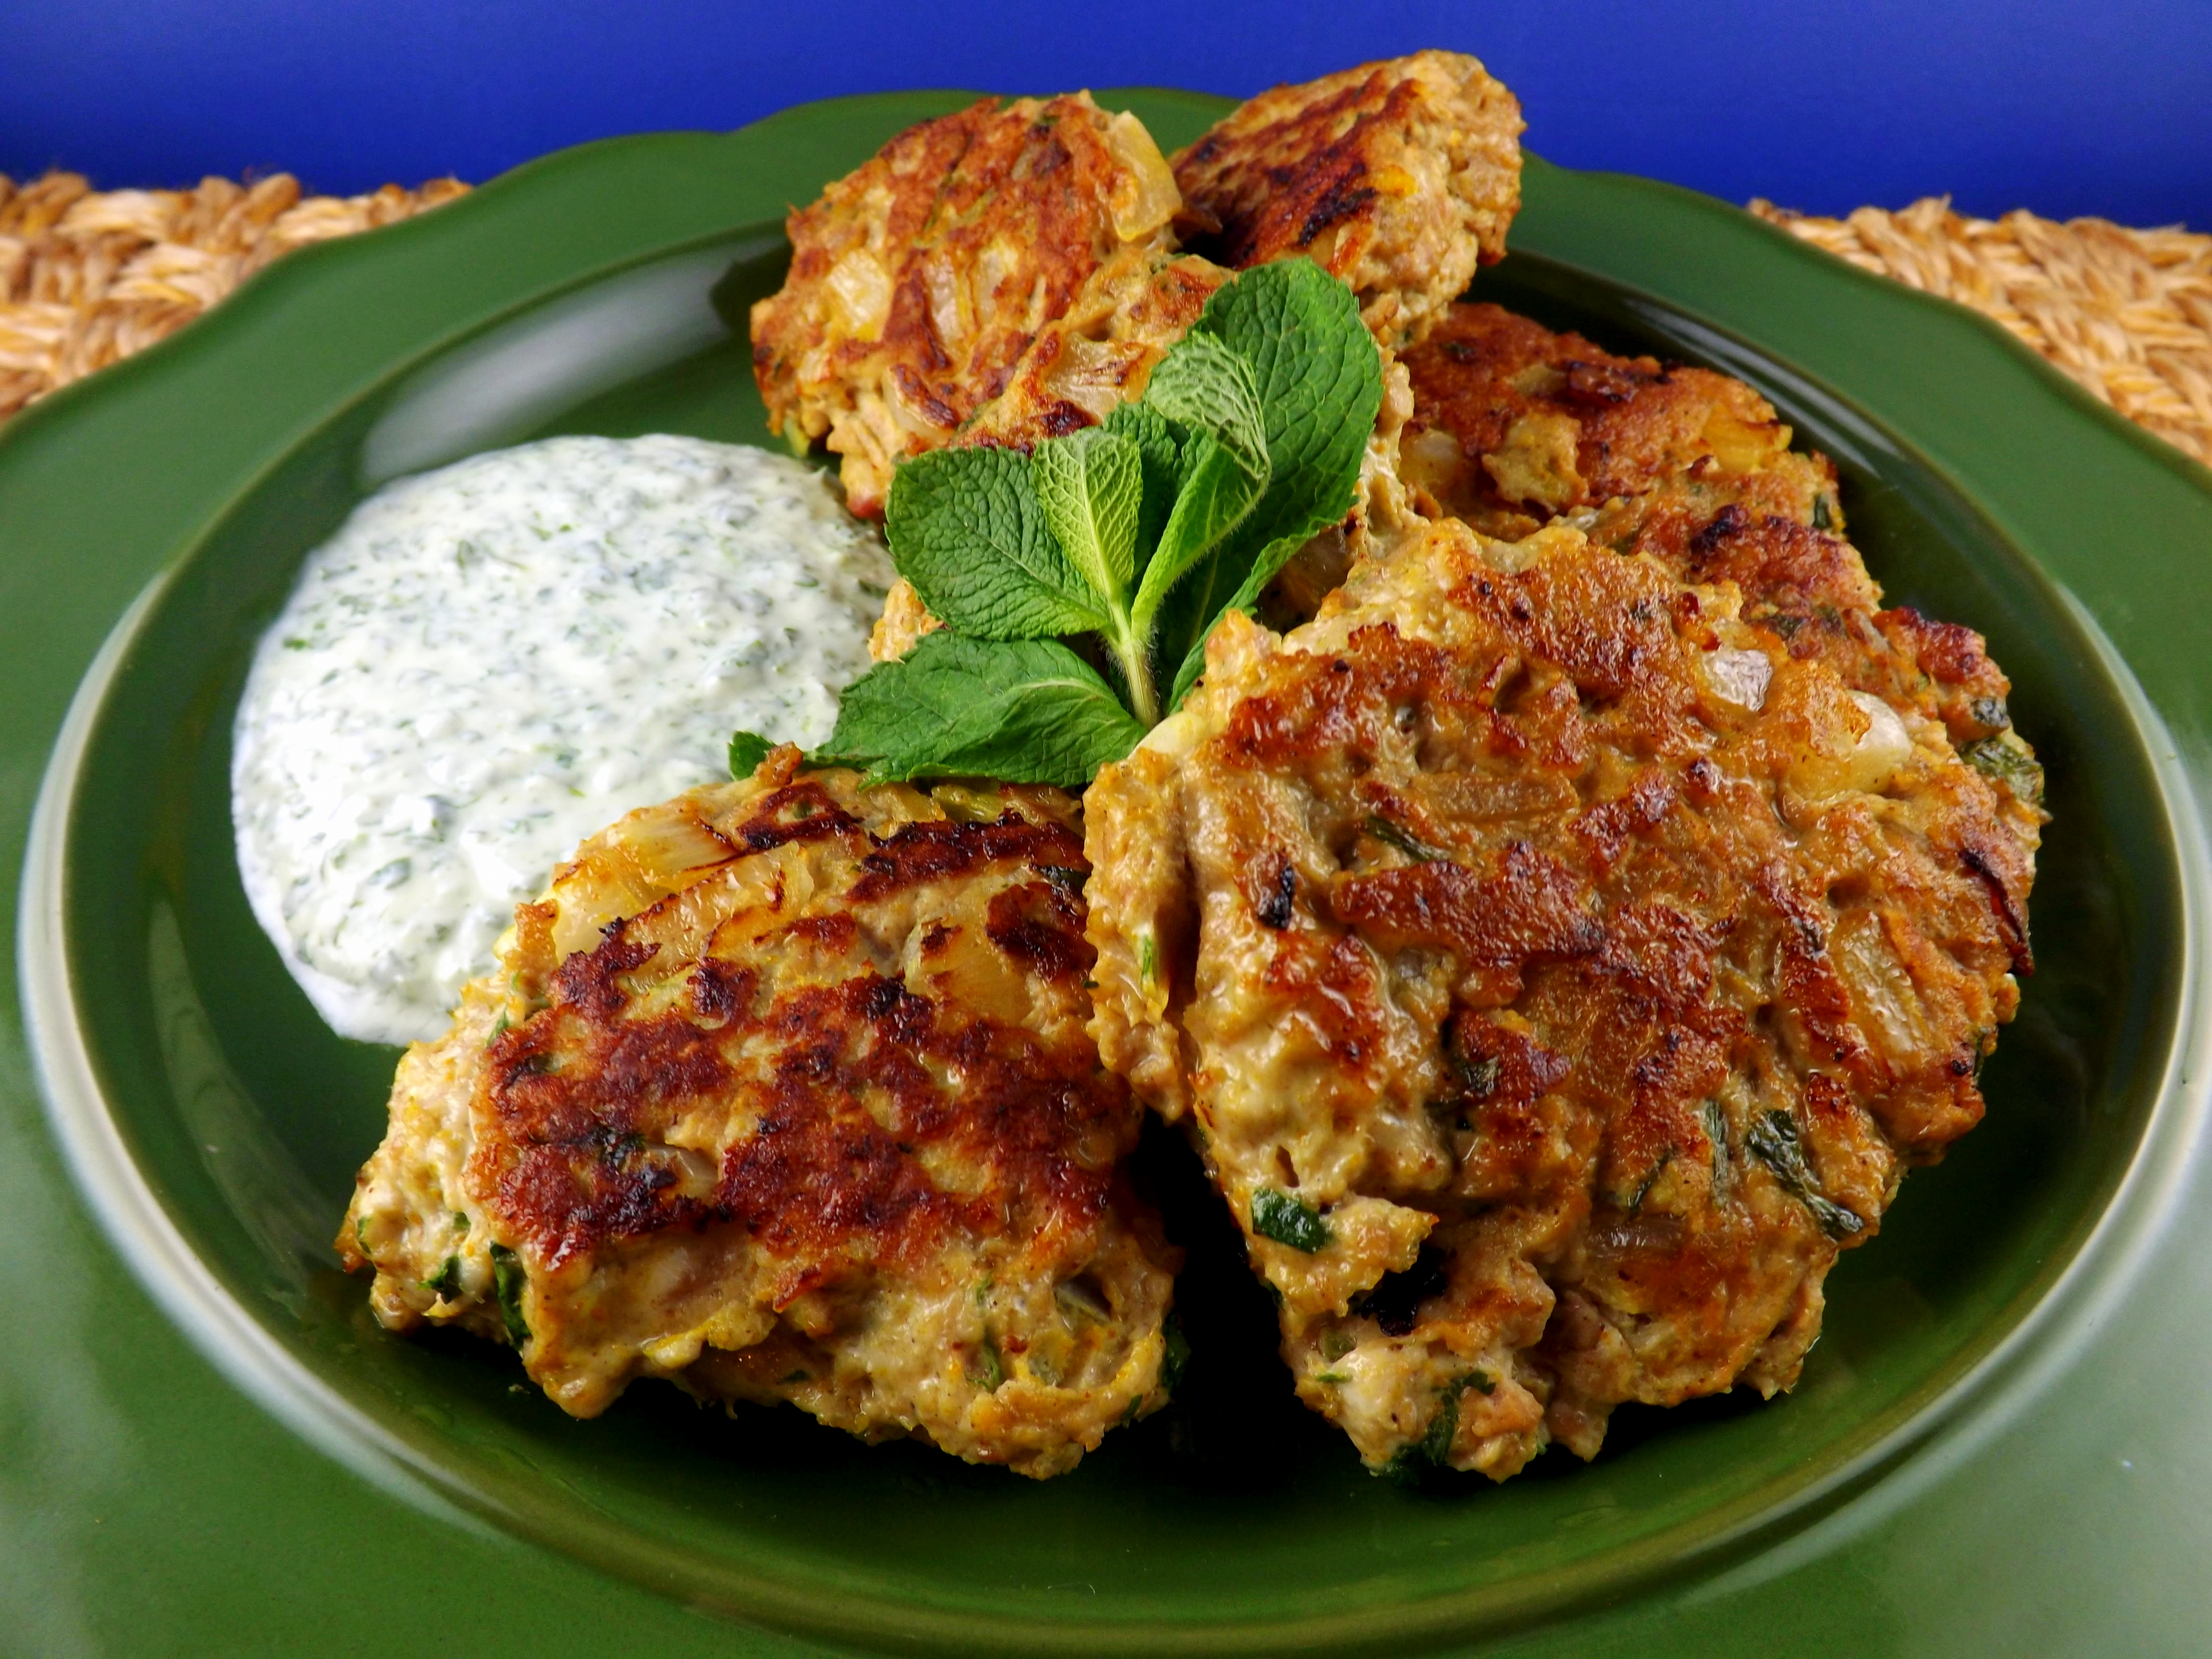 Ground Turkey Recipes Food And Wine